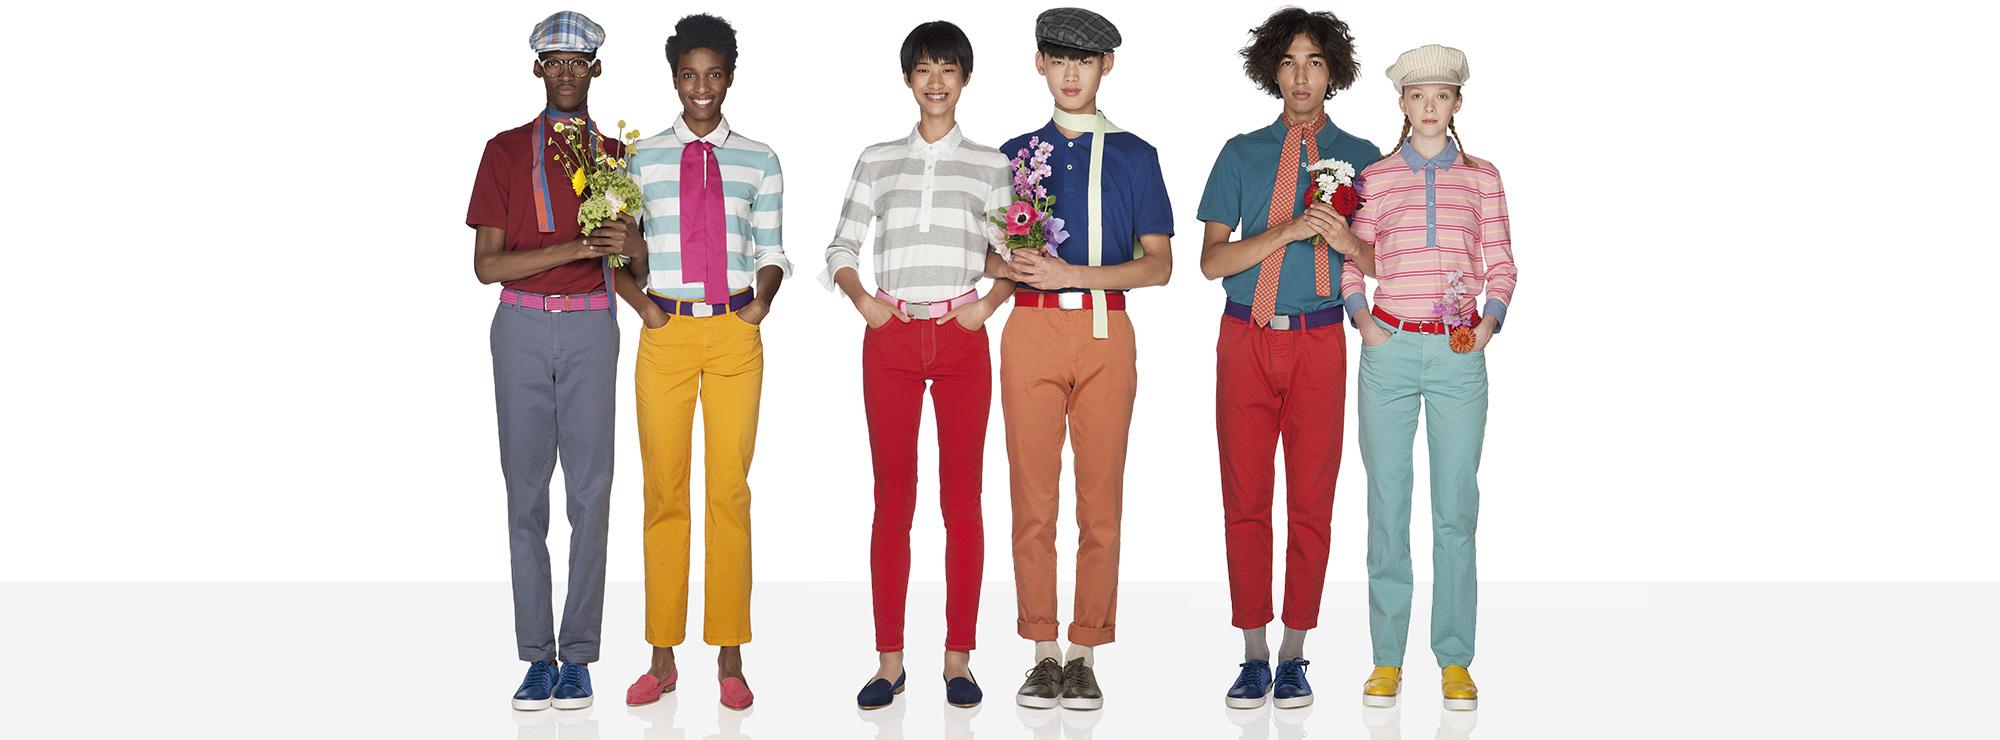 united colors of benetton official site online shop